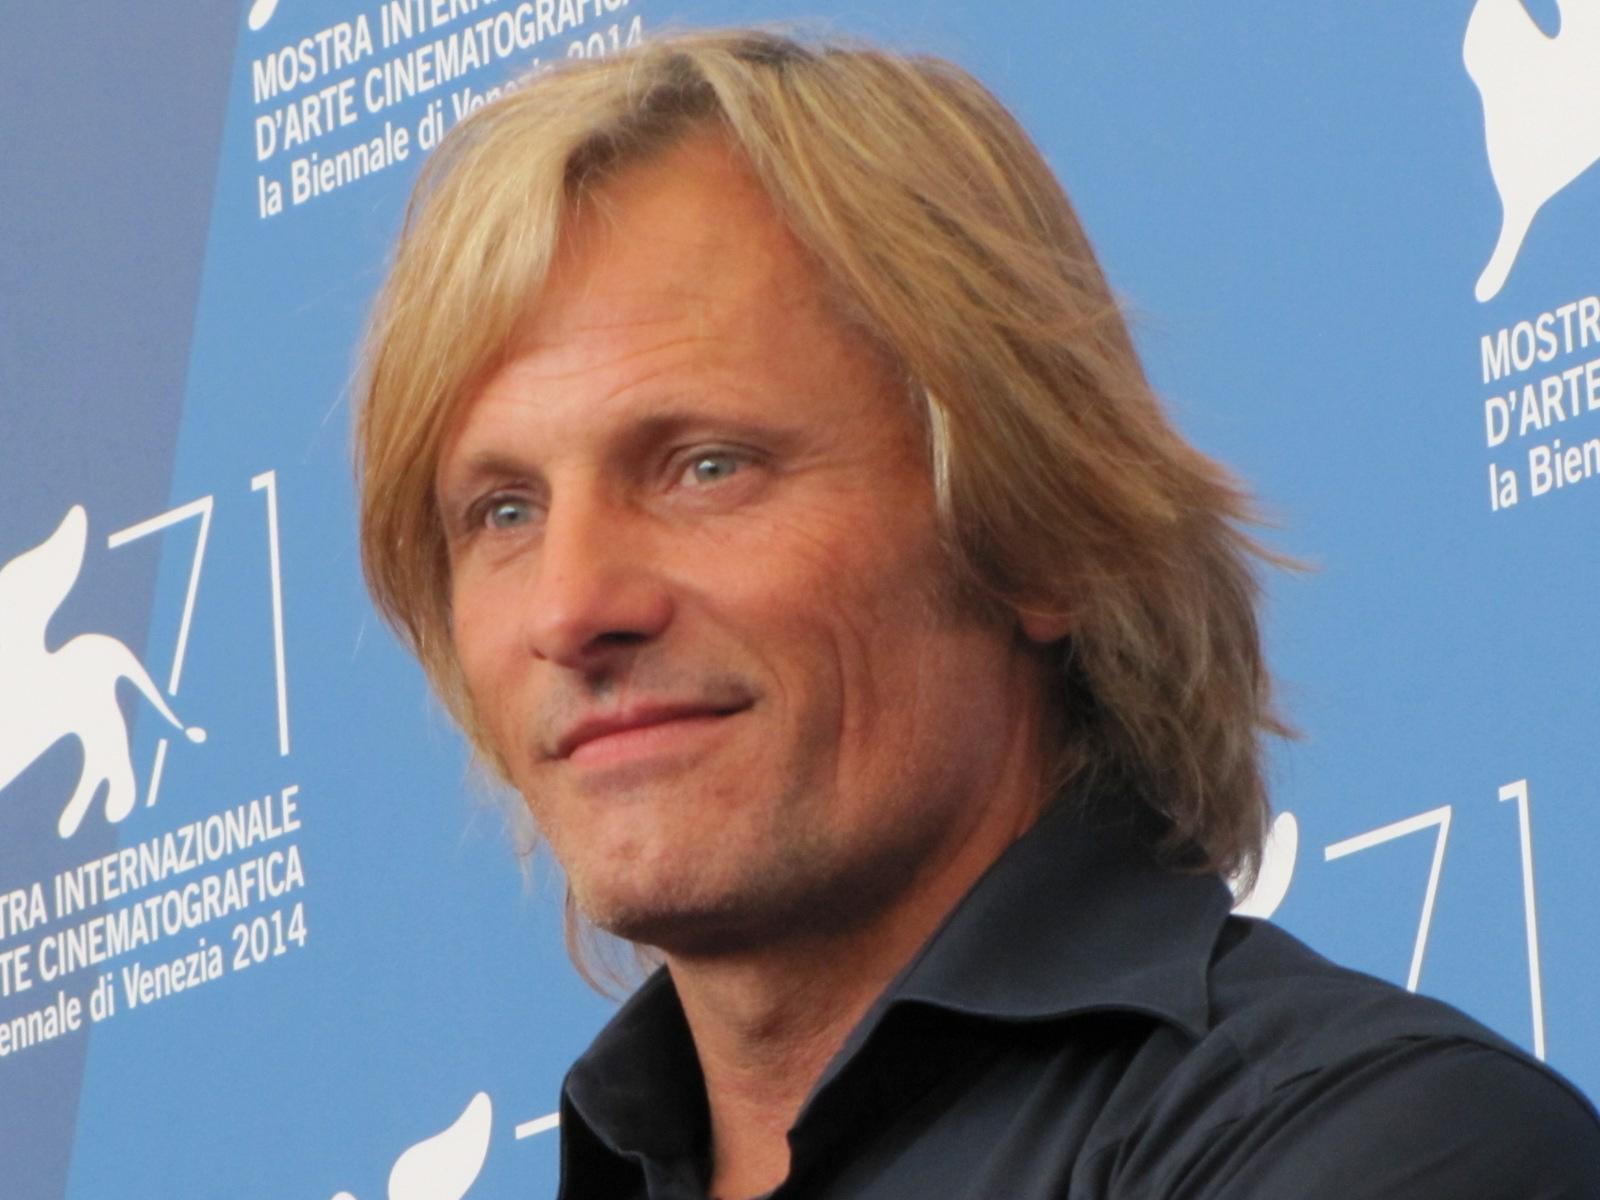 Loin des Hommes, Viggo Mortensen presenta il film a Venezia 2014